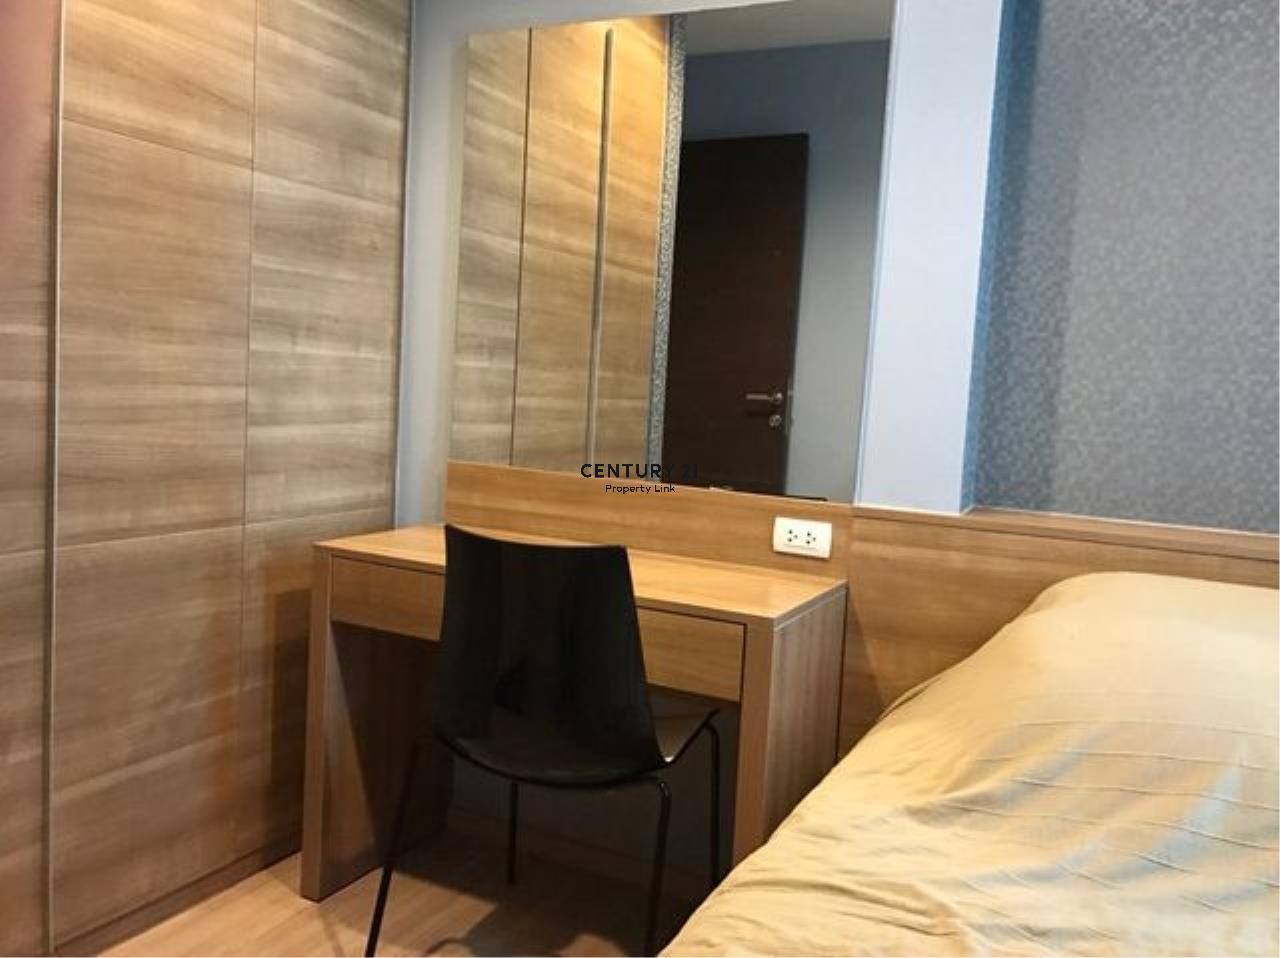 Century21 Property Link Agency's 39-CC-61433 Rhythm Sathorn Room For Sale 2 Bedroom Sathorn Bangrak Nearby Saphan Taksin BTS Sale price 9.75 MB.   4